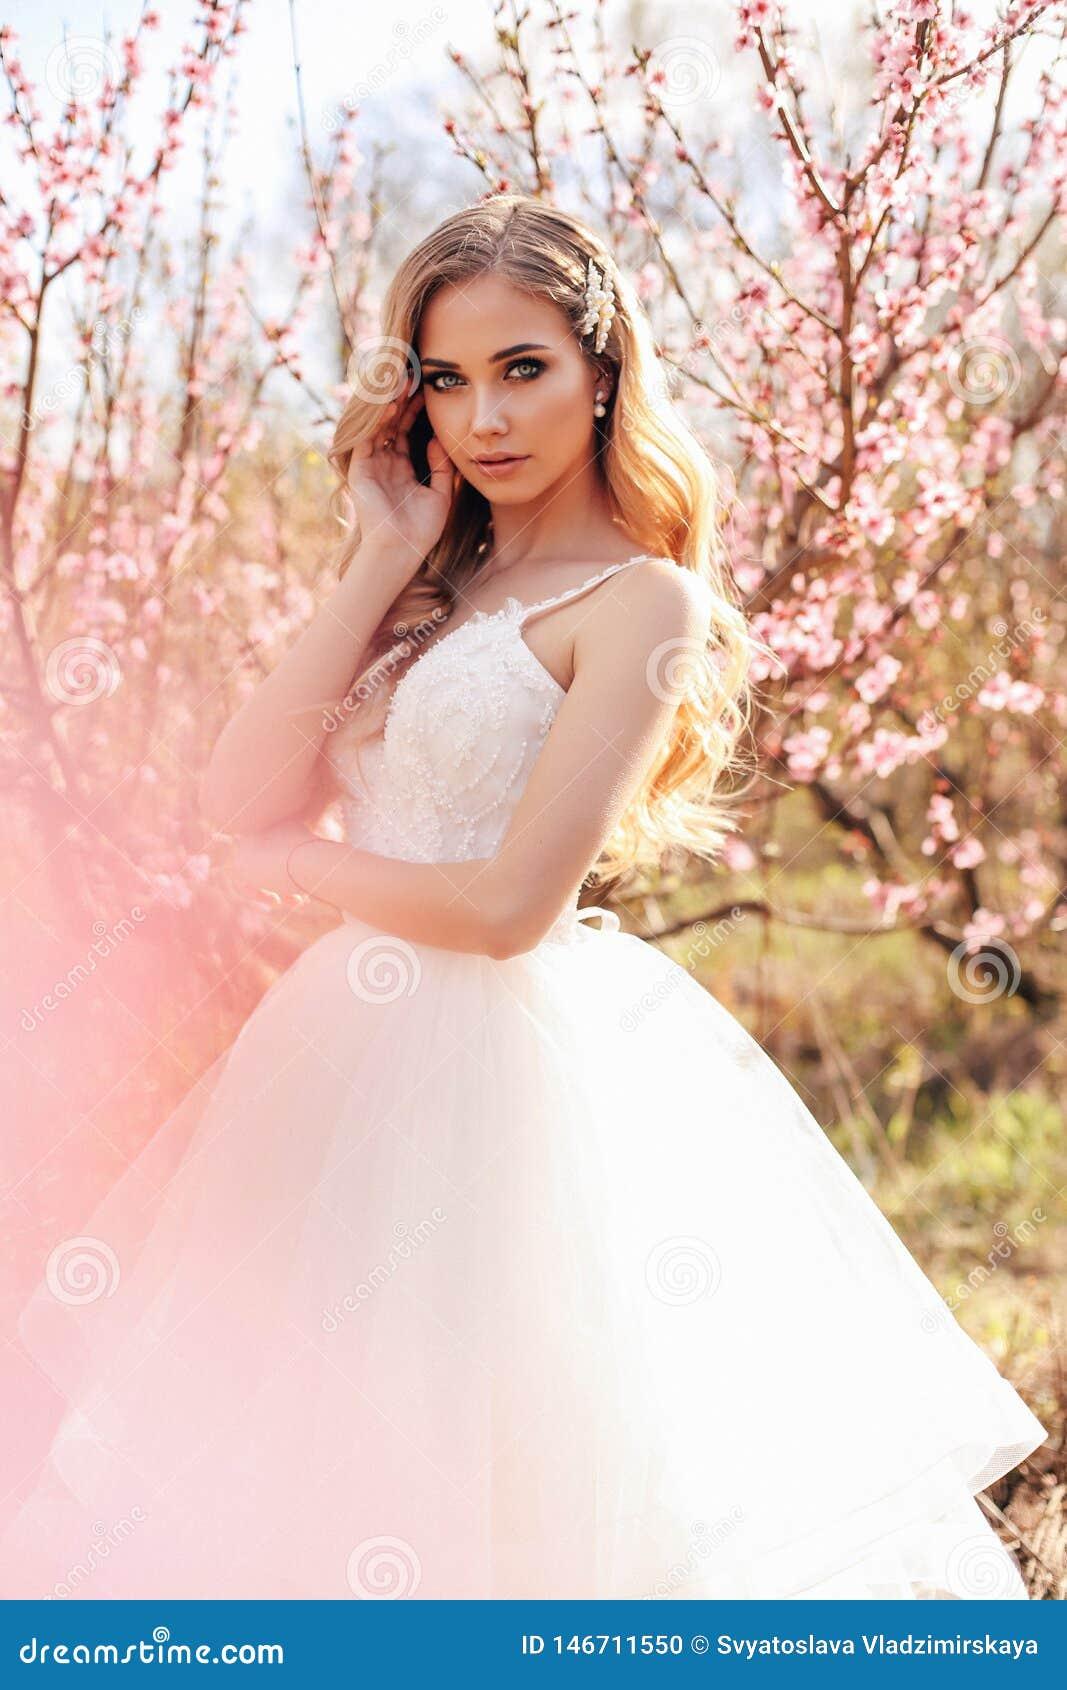 Beautiful Girl With Blond Hair In Elegant Wedding Dress Posing